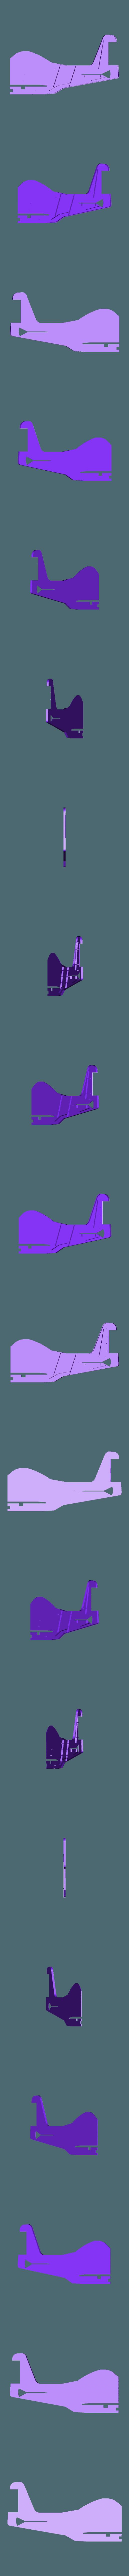 Body Rear Rev01.STL Download free STL file V1 Release - New RC Plane • 3D printable design, Trikonics